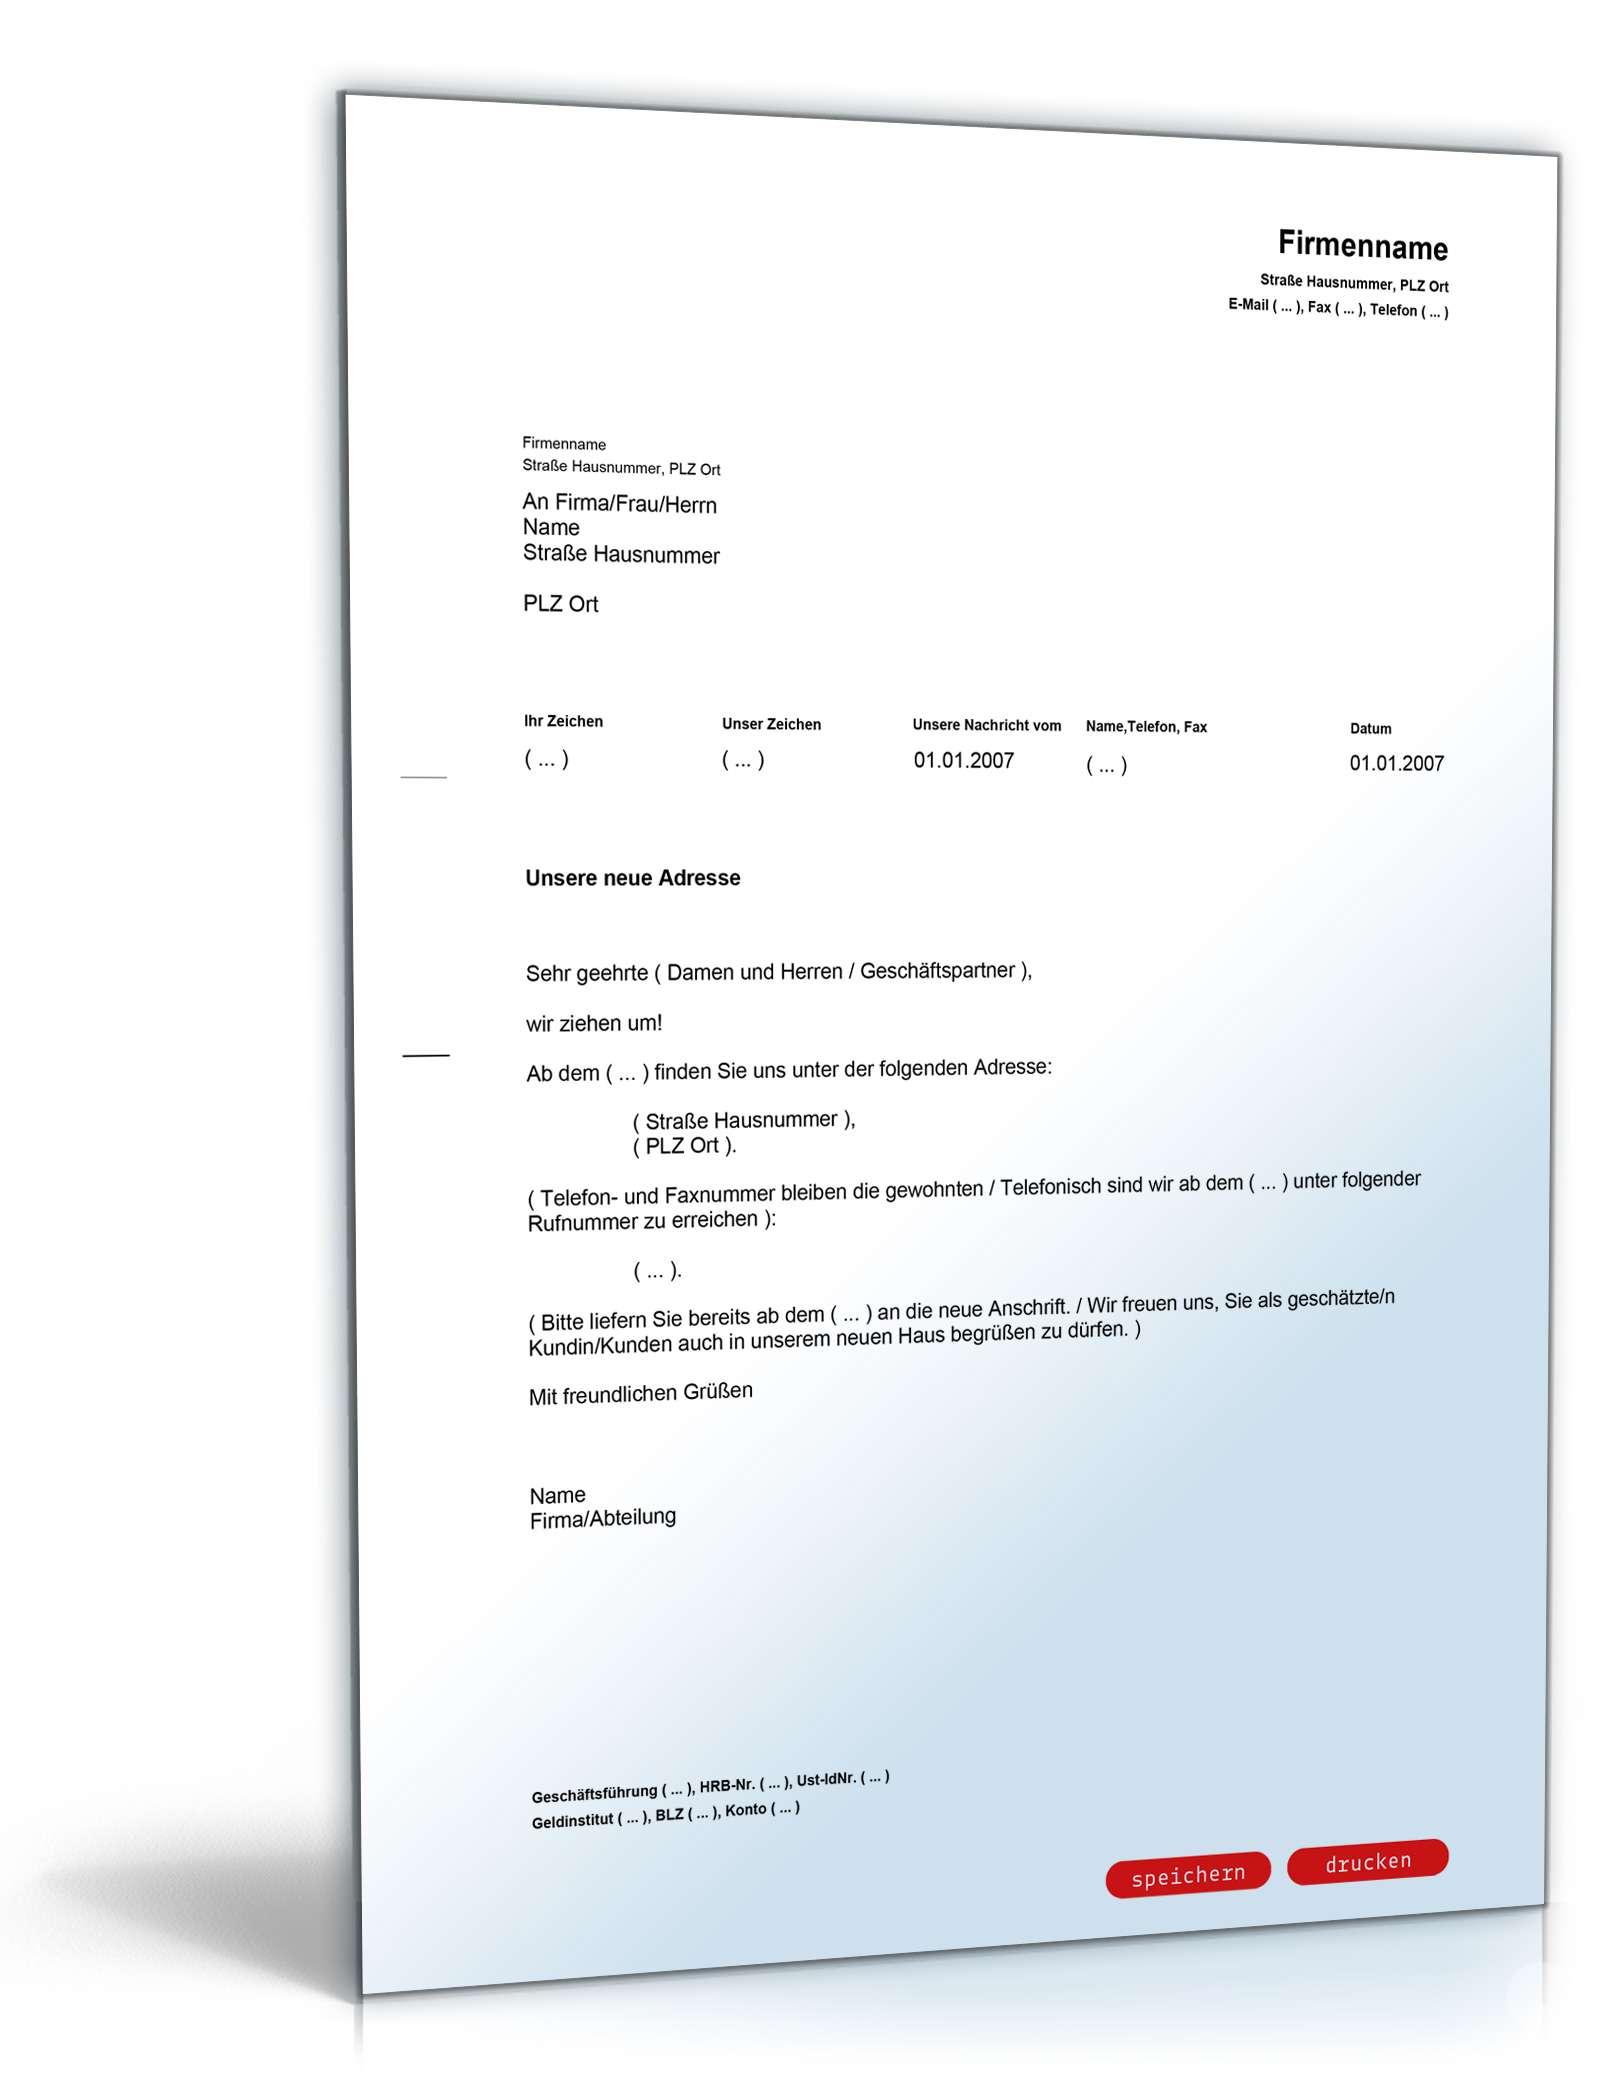 Wir ziehen um! | Muster als PDF & Doc GRATIS zum Download